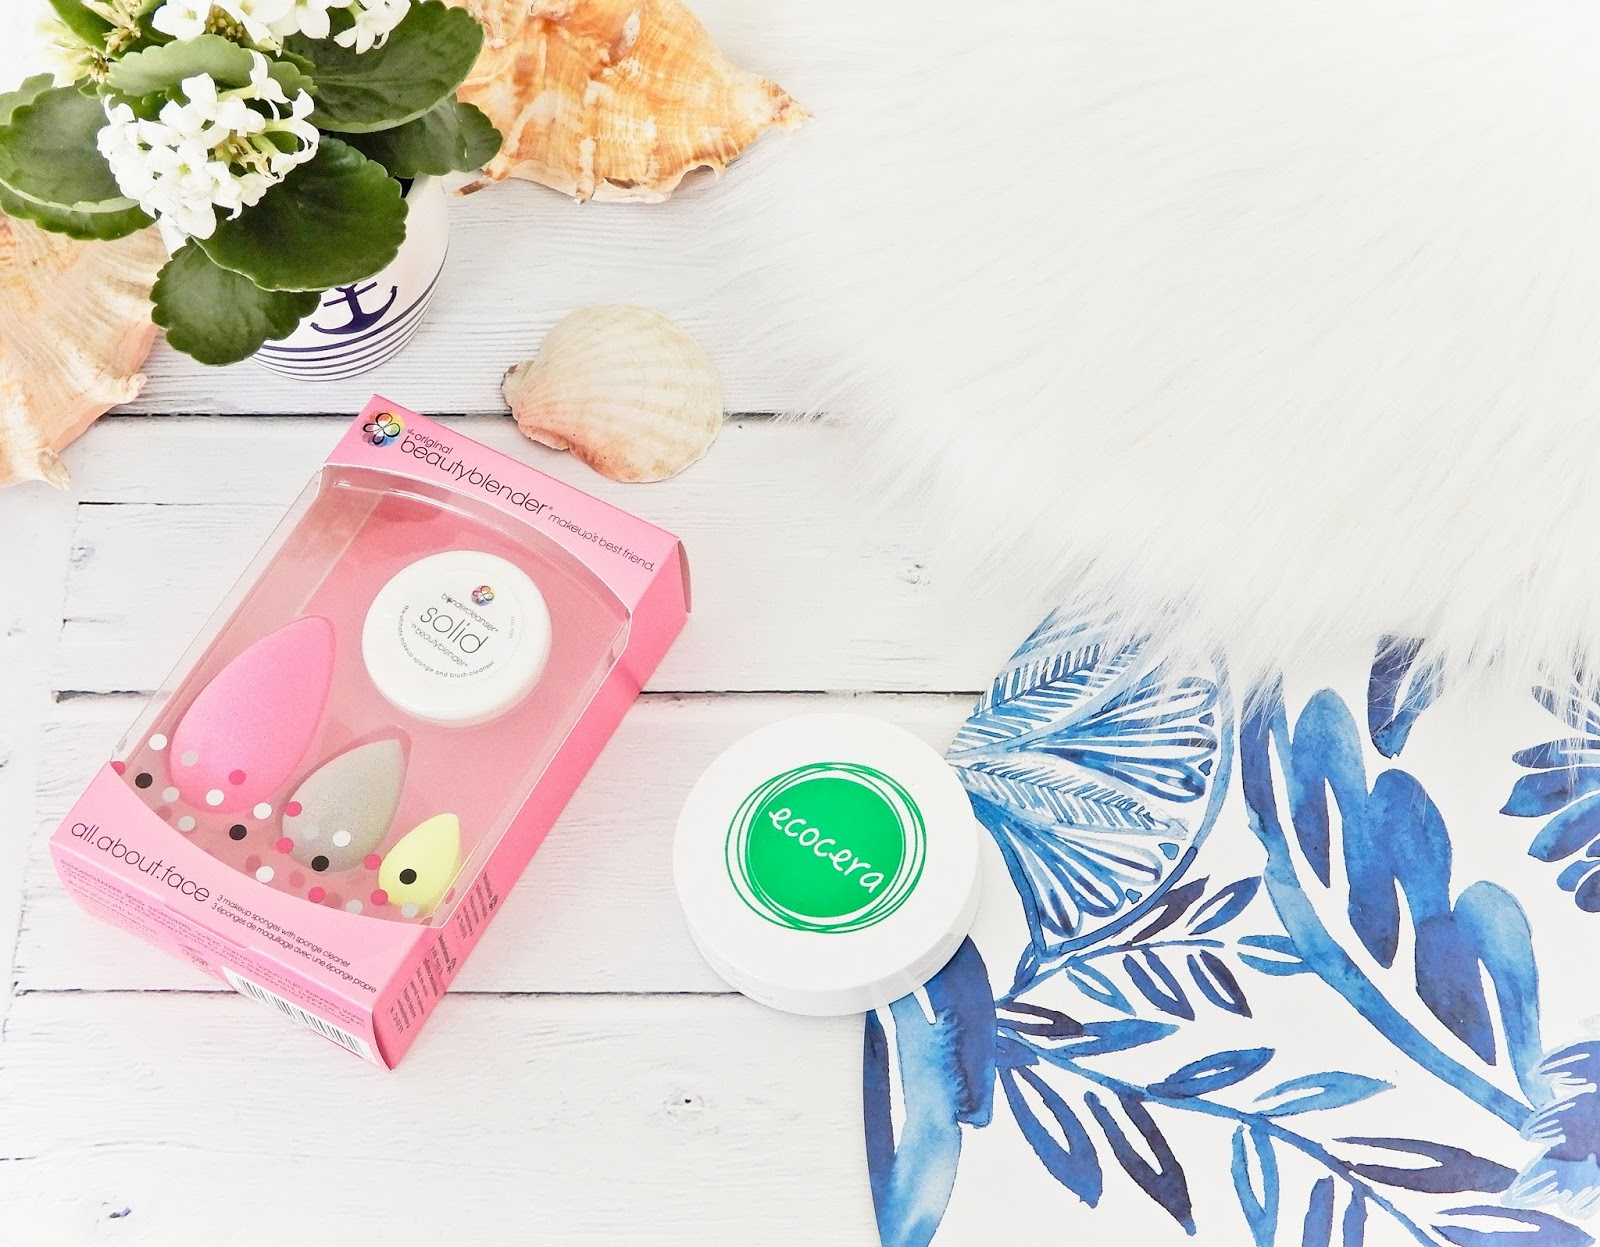 zestaw BeautyBlender All About Face, prasowany puder z Ecocery, haul zakupowy,